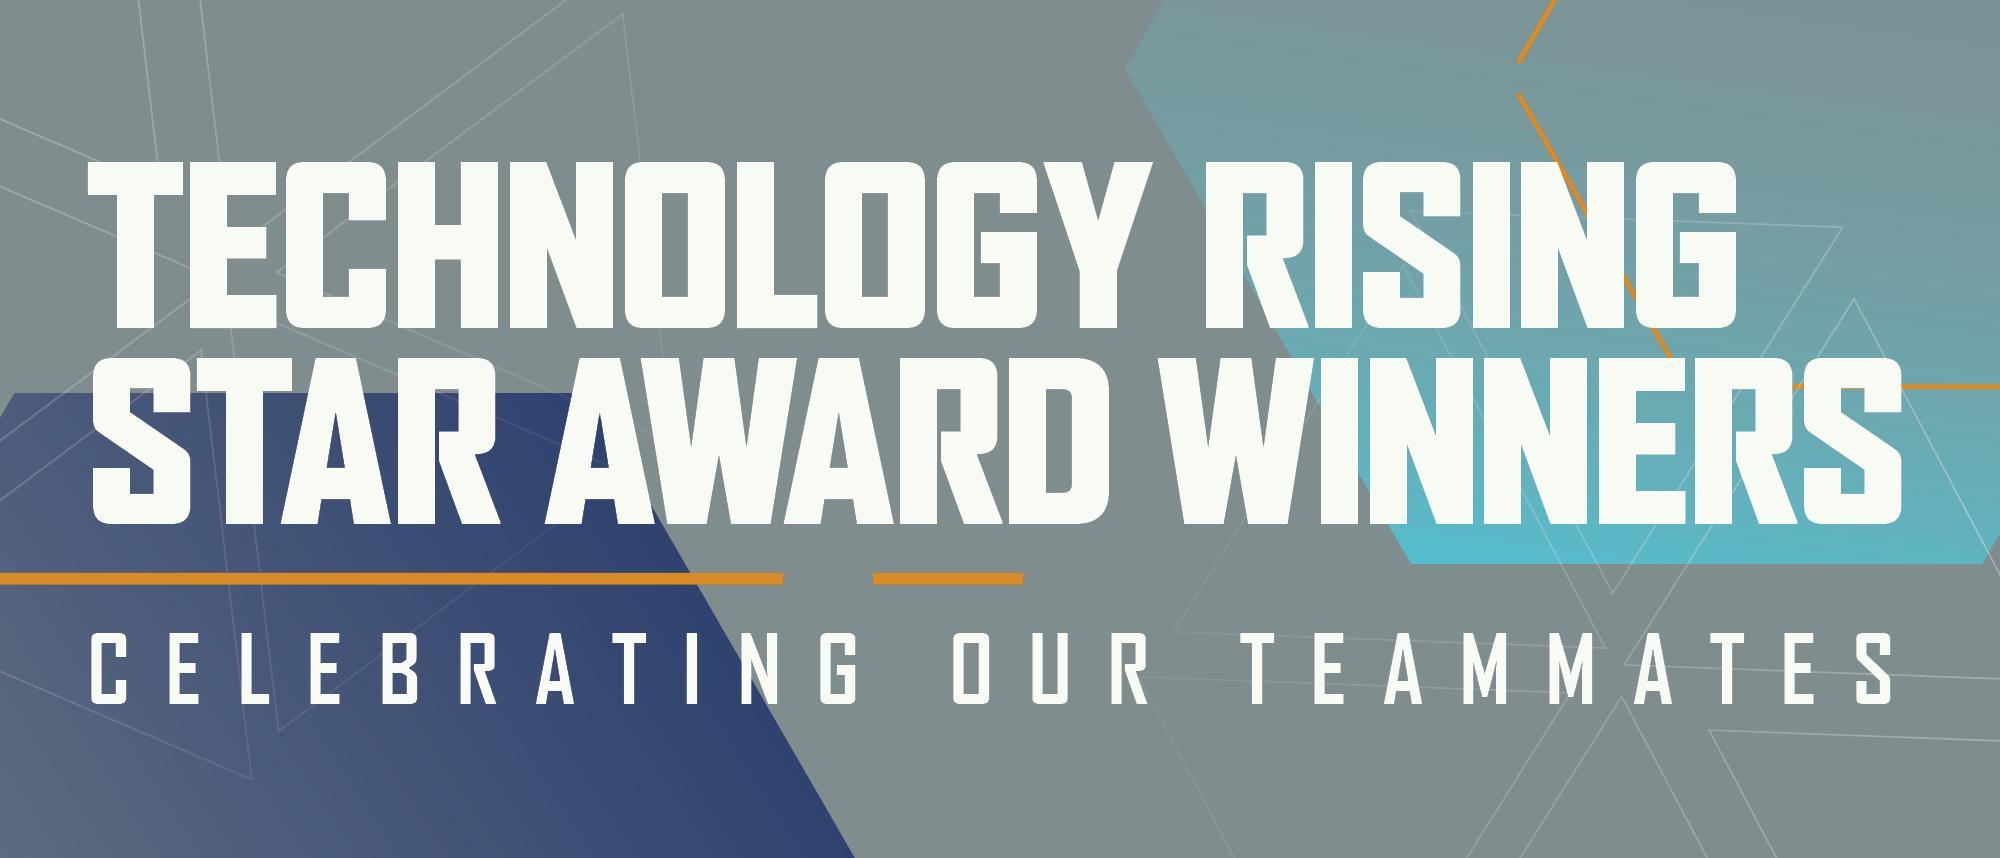 Celebrating our Teammates - Technology Rising Star Award Winners